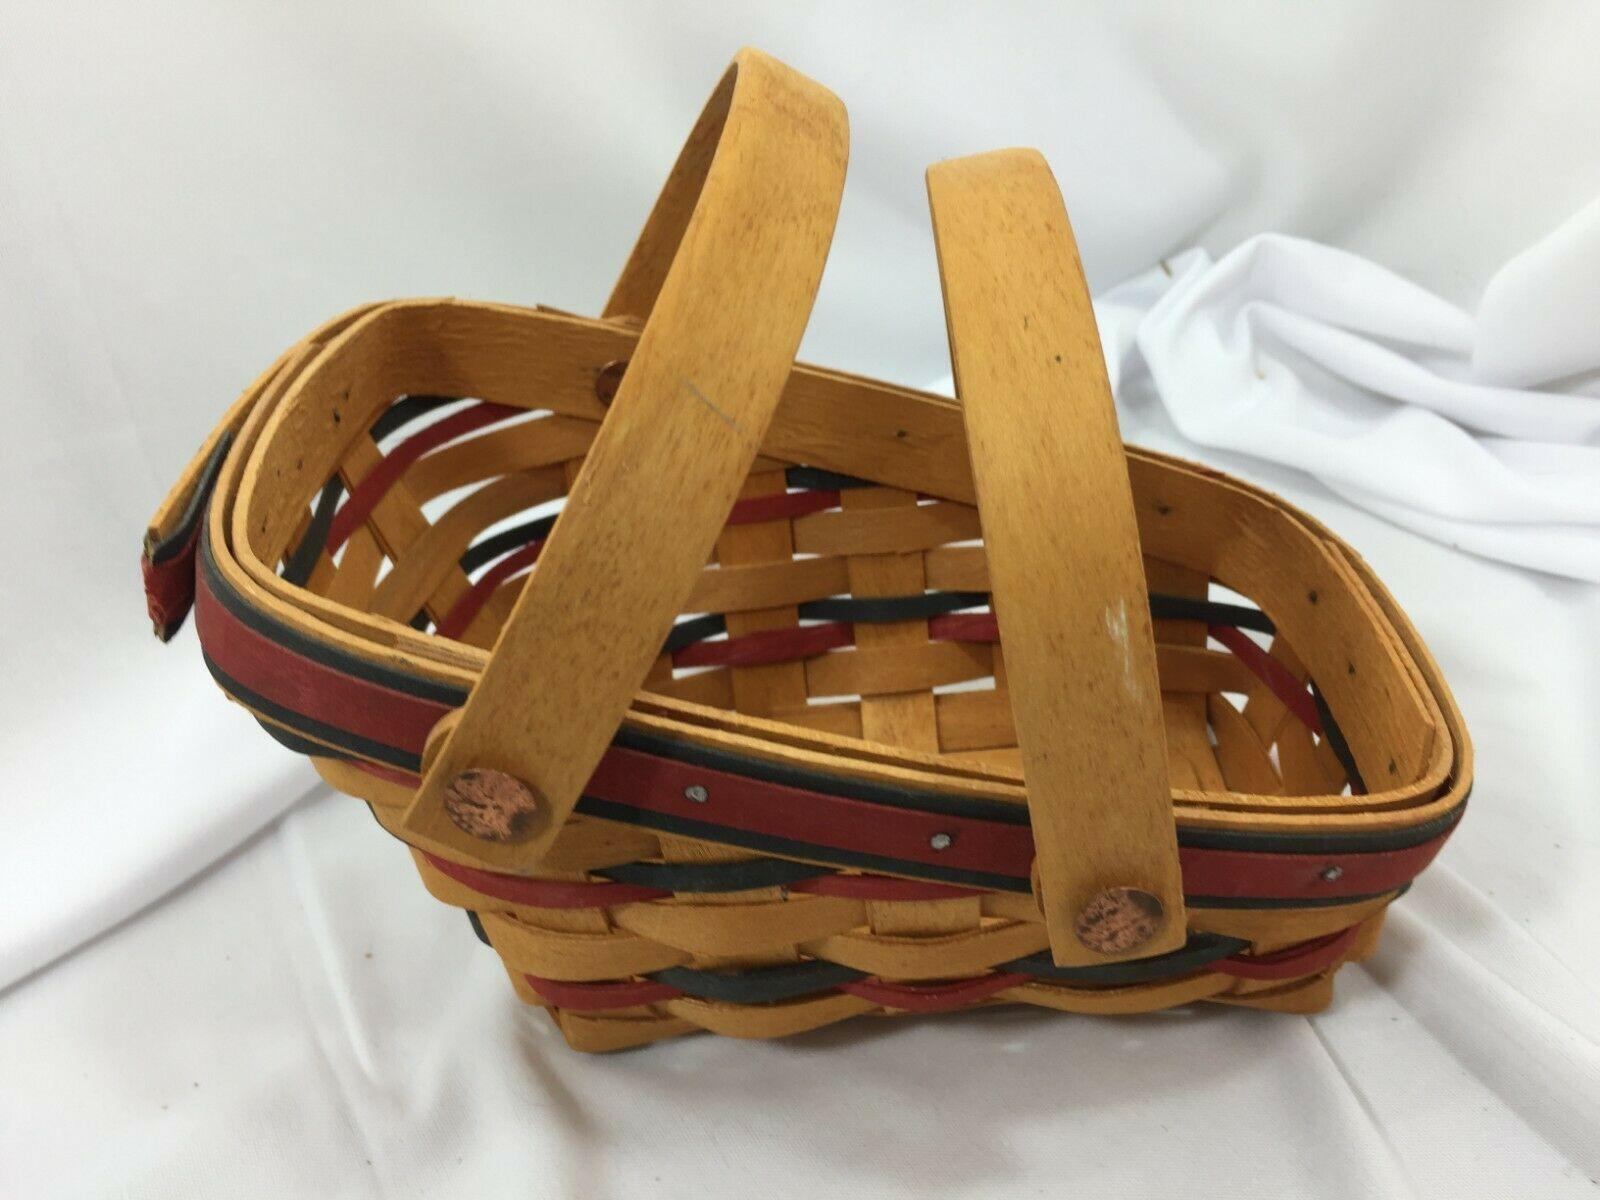 LONGABERGER Mini Vegetable Basket w/ Handles 1996 Vintage 26373 All American